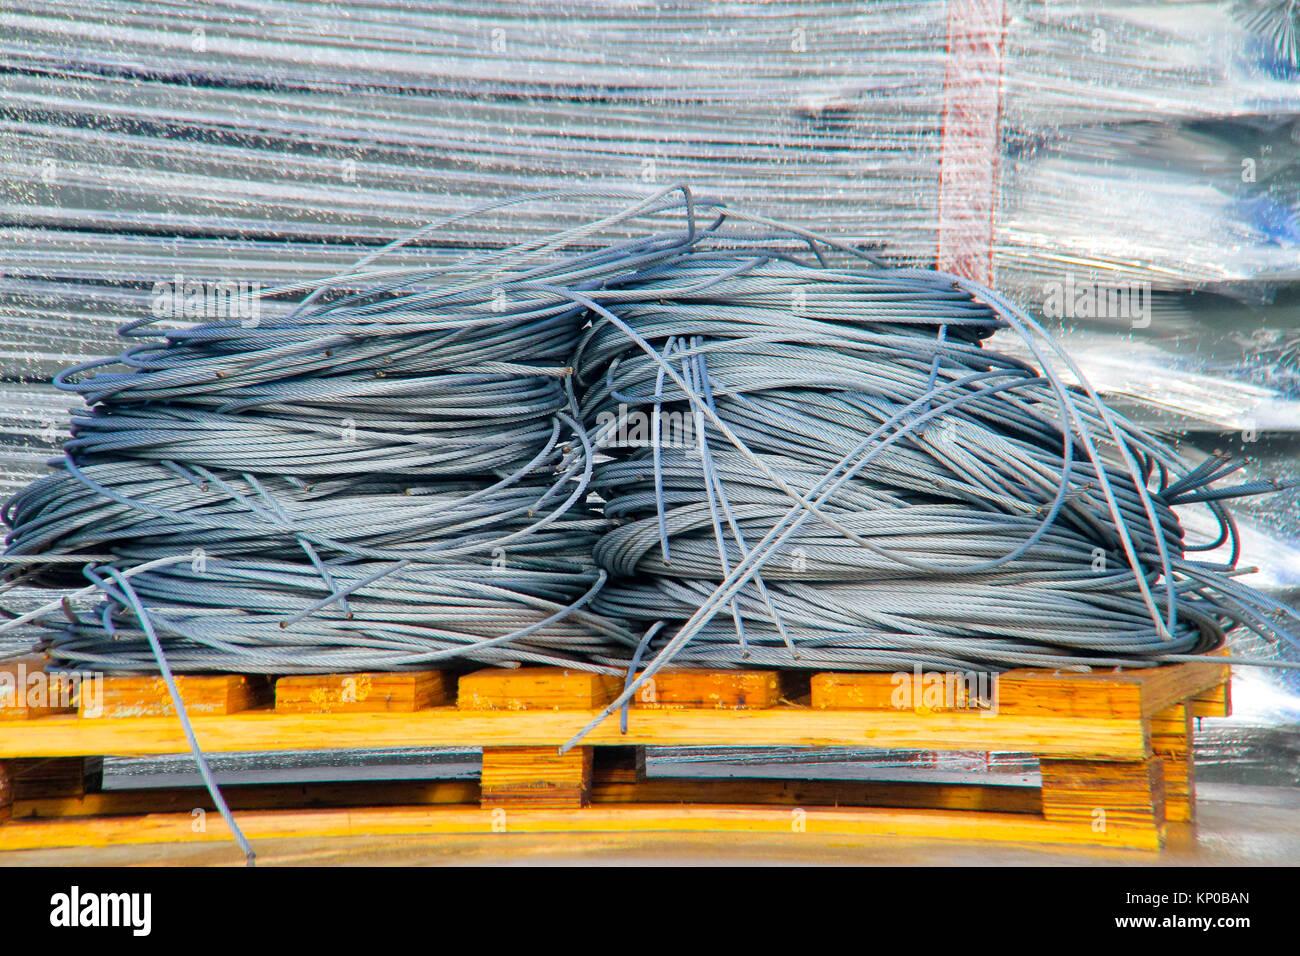 Draht aus Stahl oder Stahl Seil oder Drahtseil Kabel oder Drahtseil ...